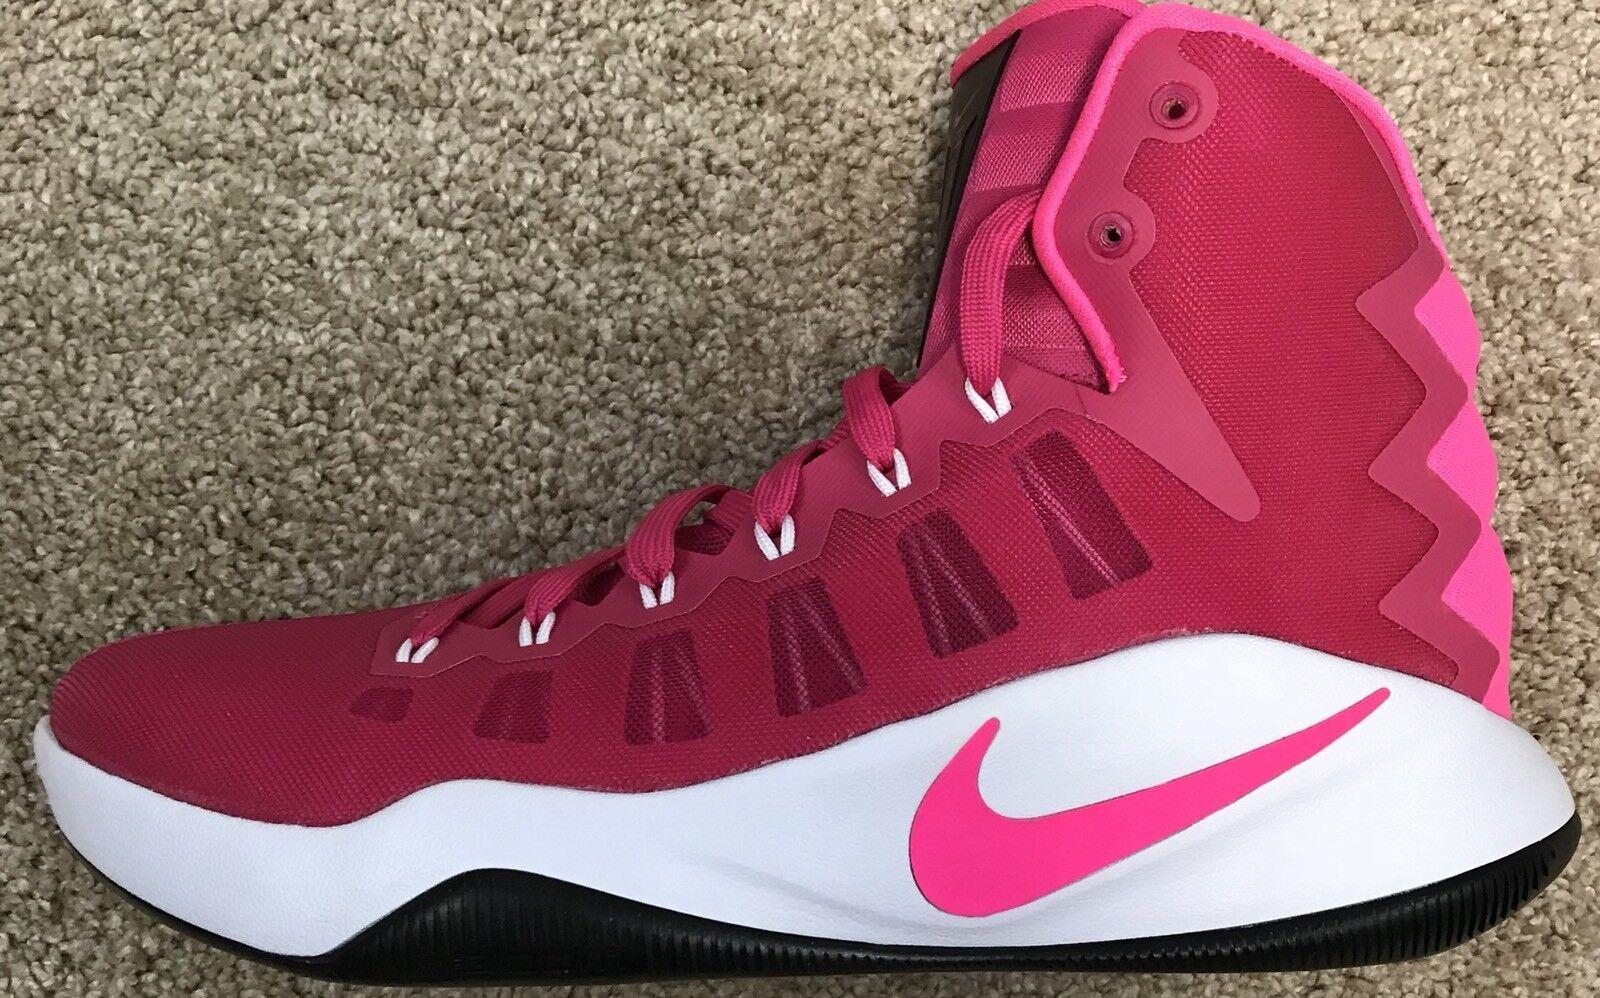 Nike Hyperdunk 2016 Basketball Breast Cancer Pink 844359-660 Men's 10.5